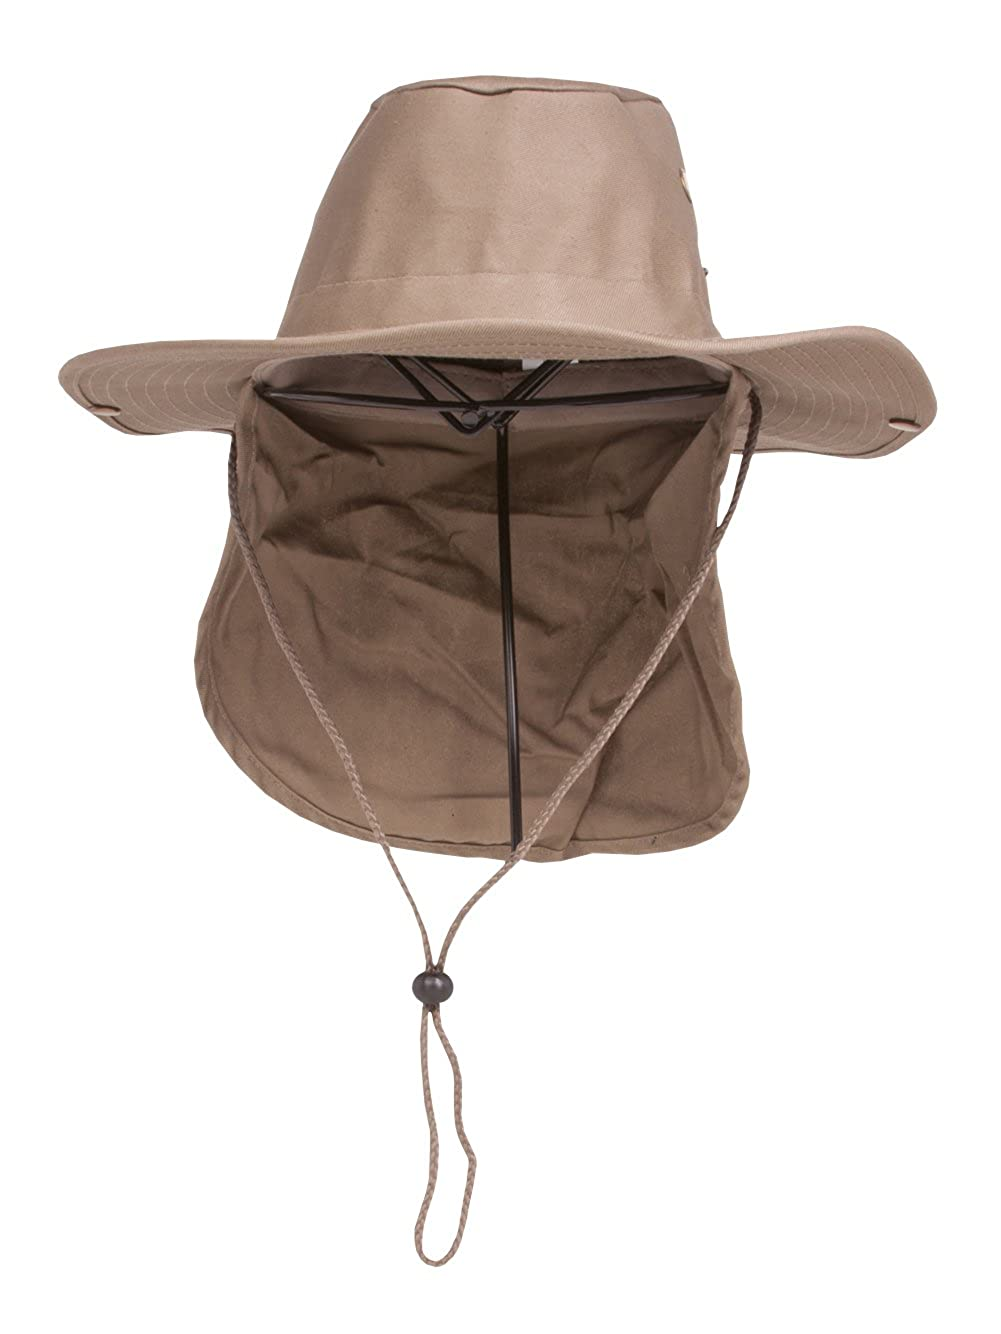 c51d50460 TOP HEADWEAR Safari Explorer Bucket Hat with Flap Neck Cover - Khaki